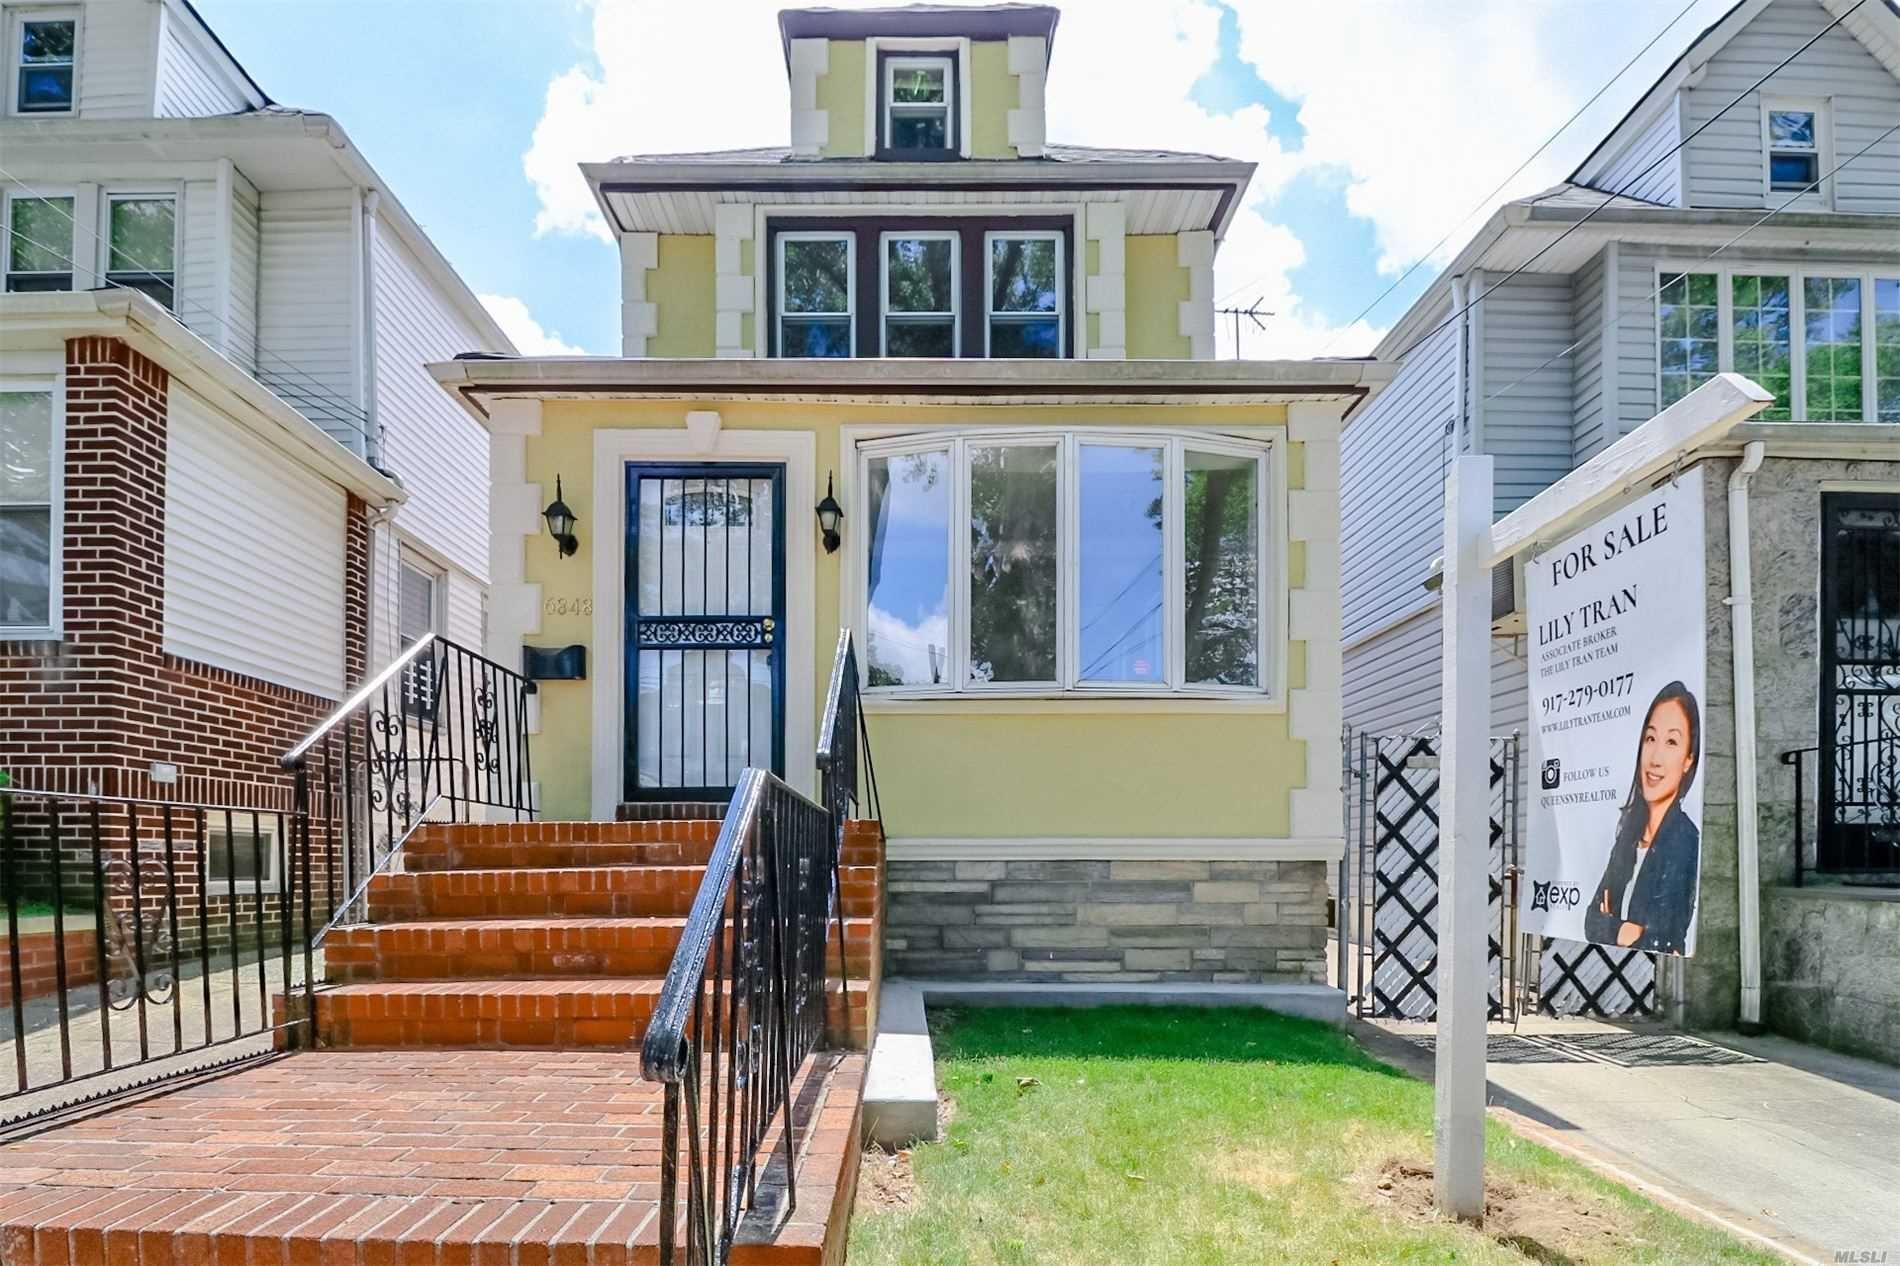 68-48 Nansen Street, Forest Hills, NY 11375 - MLS#: 3228018